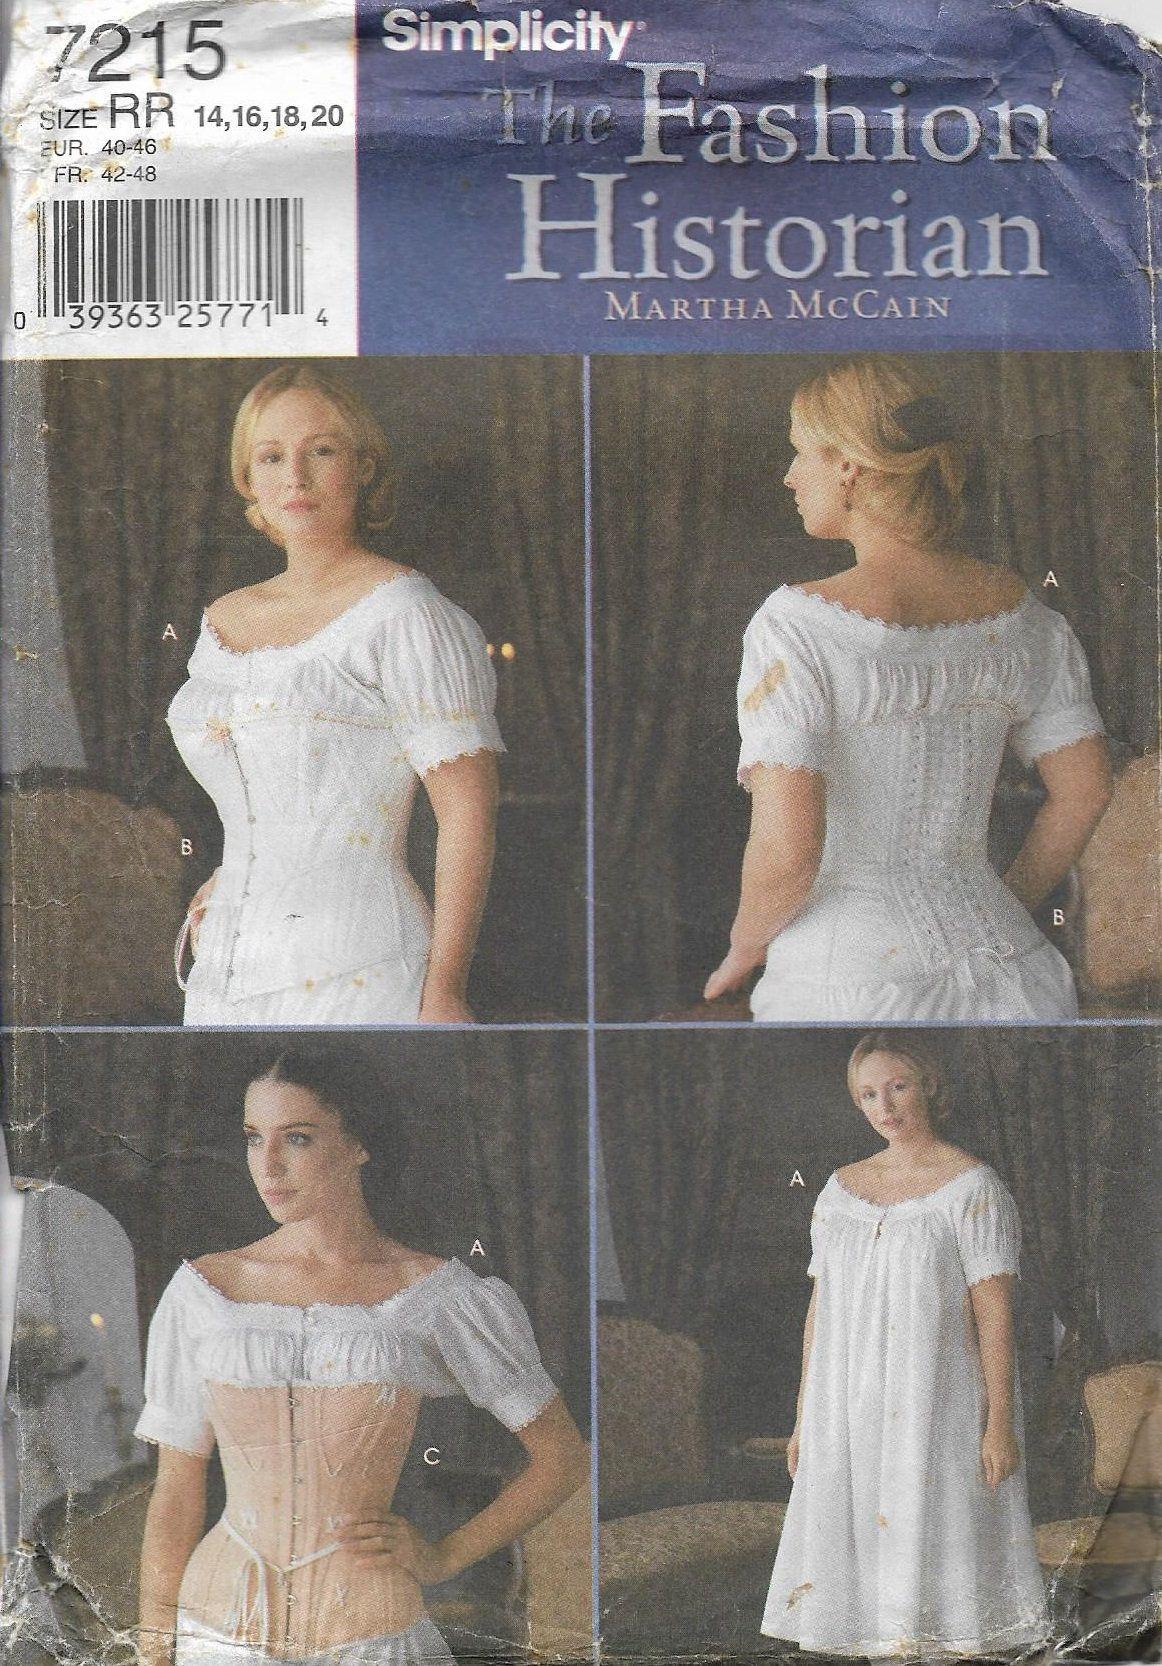 Simplicity 2890 Misses Civil War Drawers Chemise Corset Pattern 8-14 or 16-24